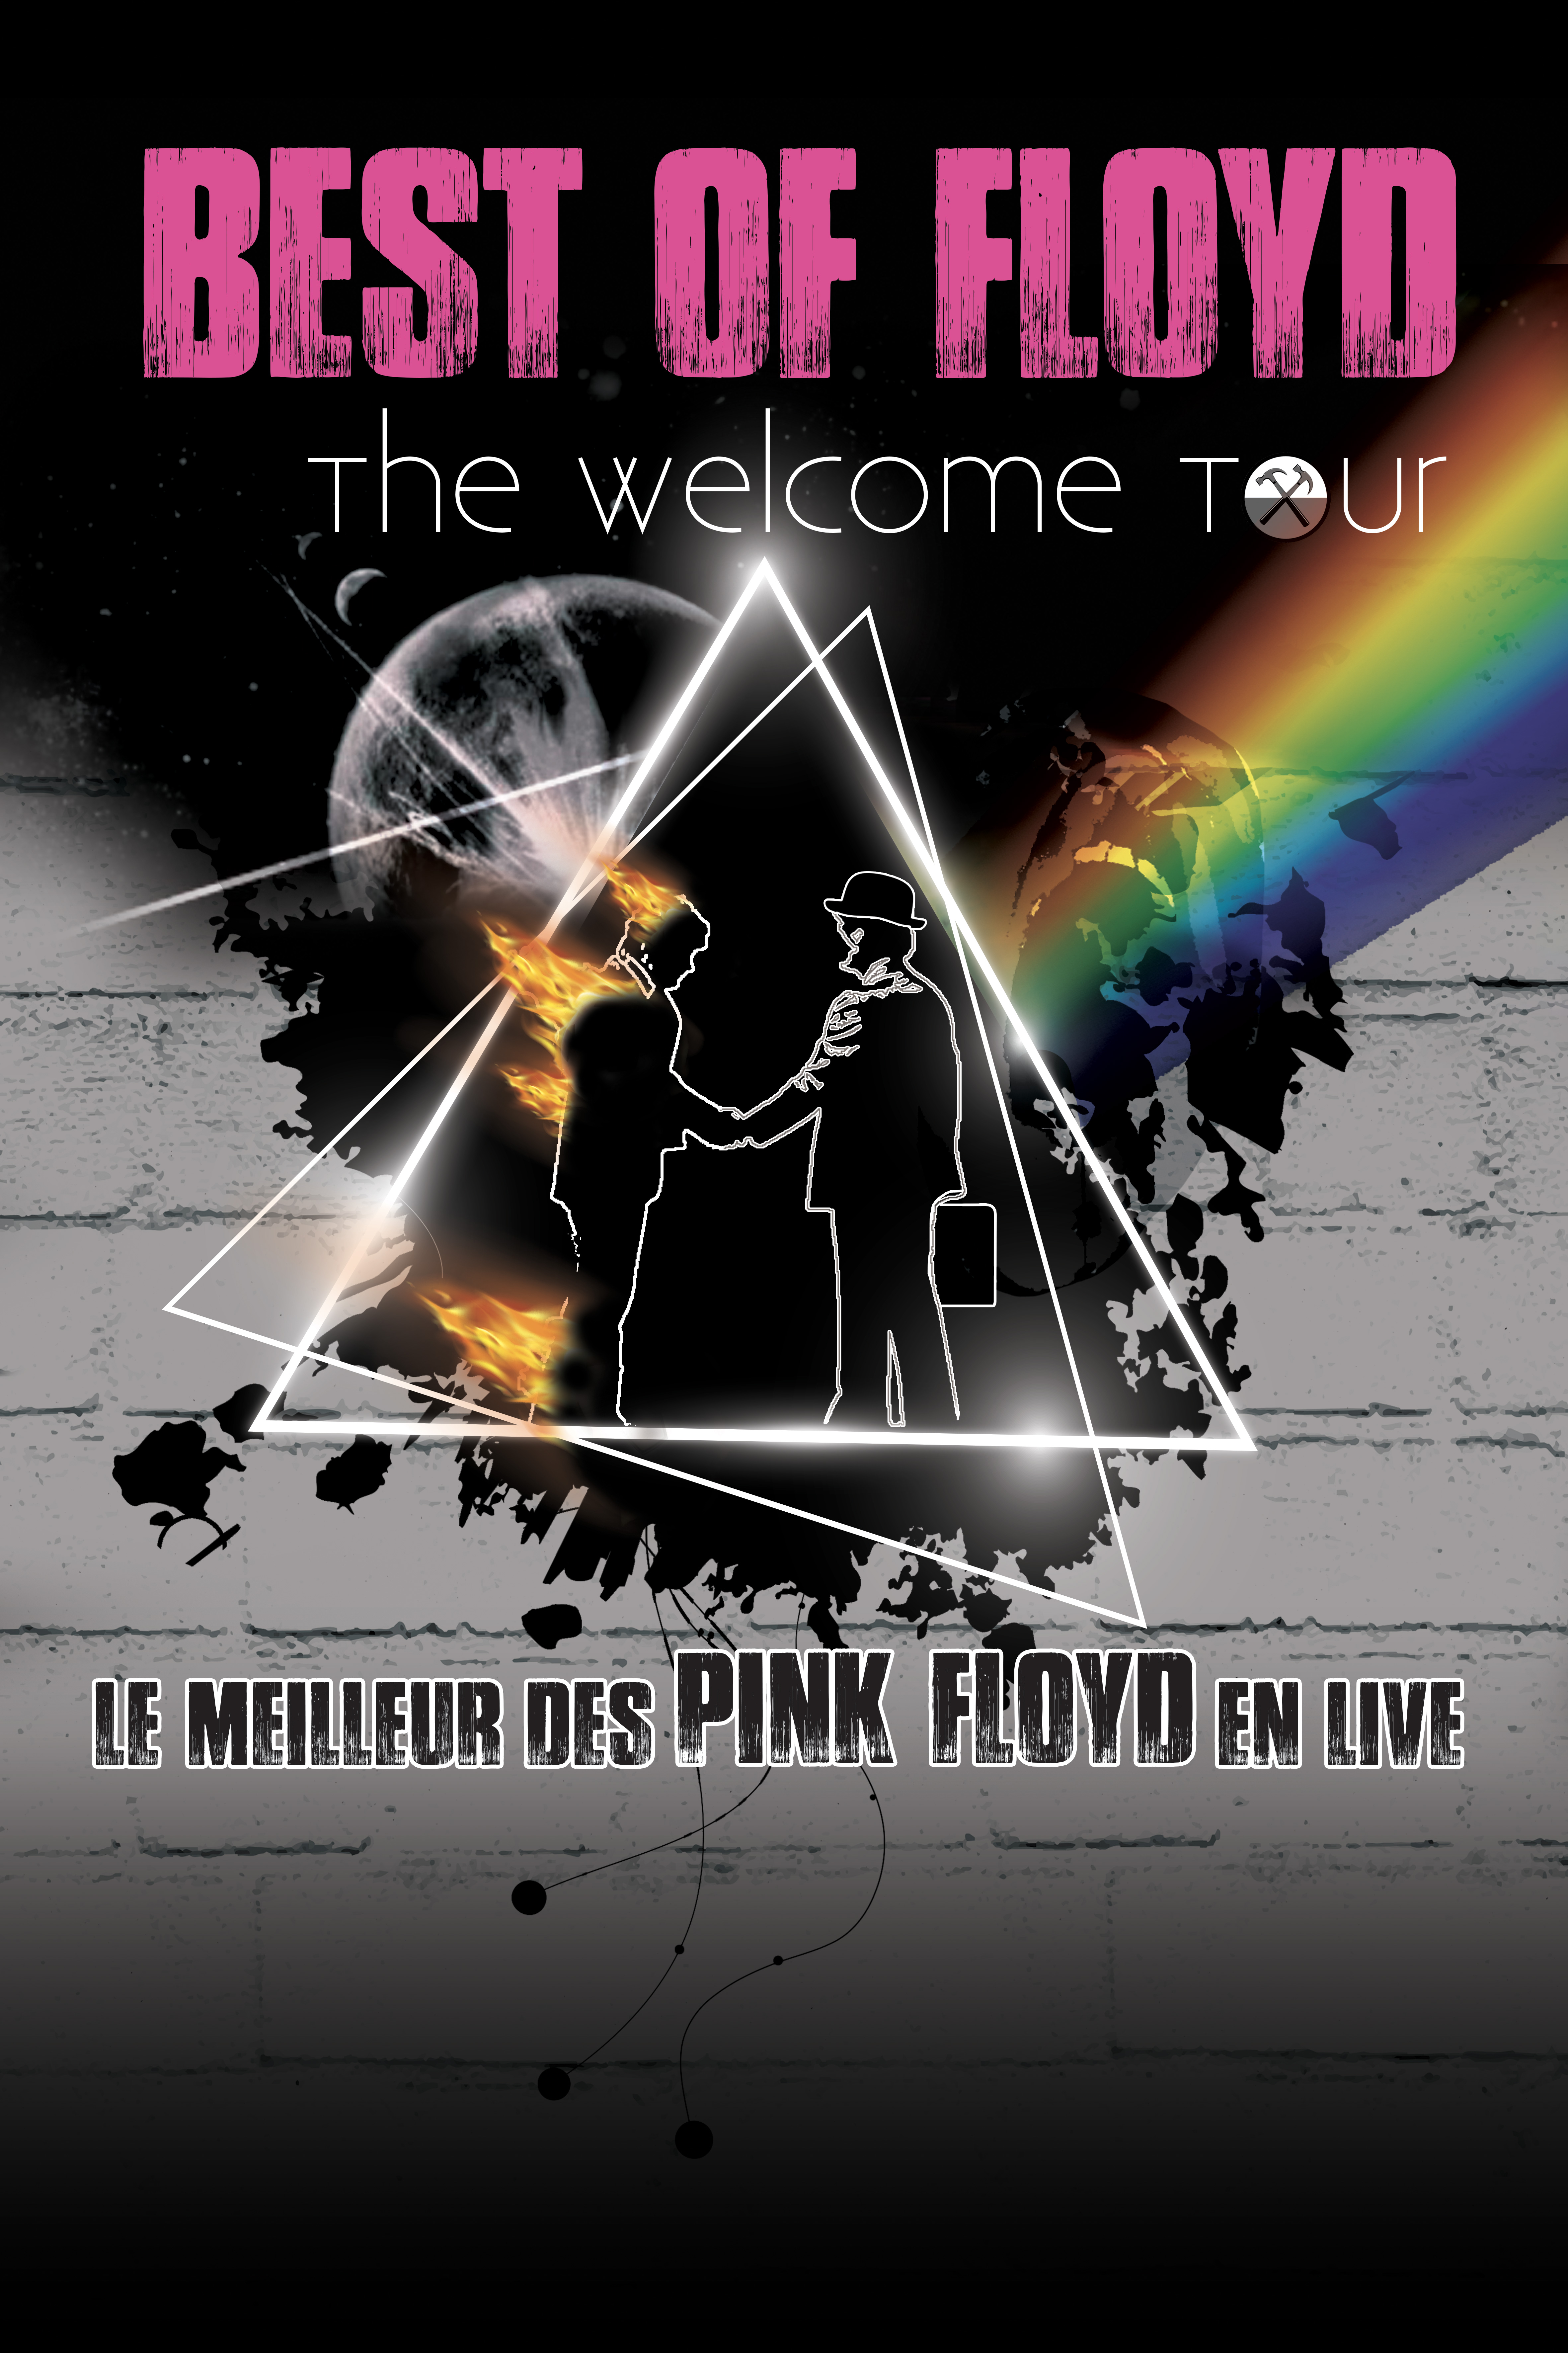 Best of Floyd, le meilleur des Pink Floyd